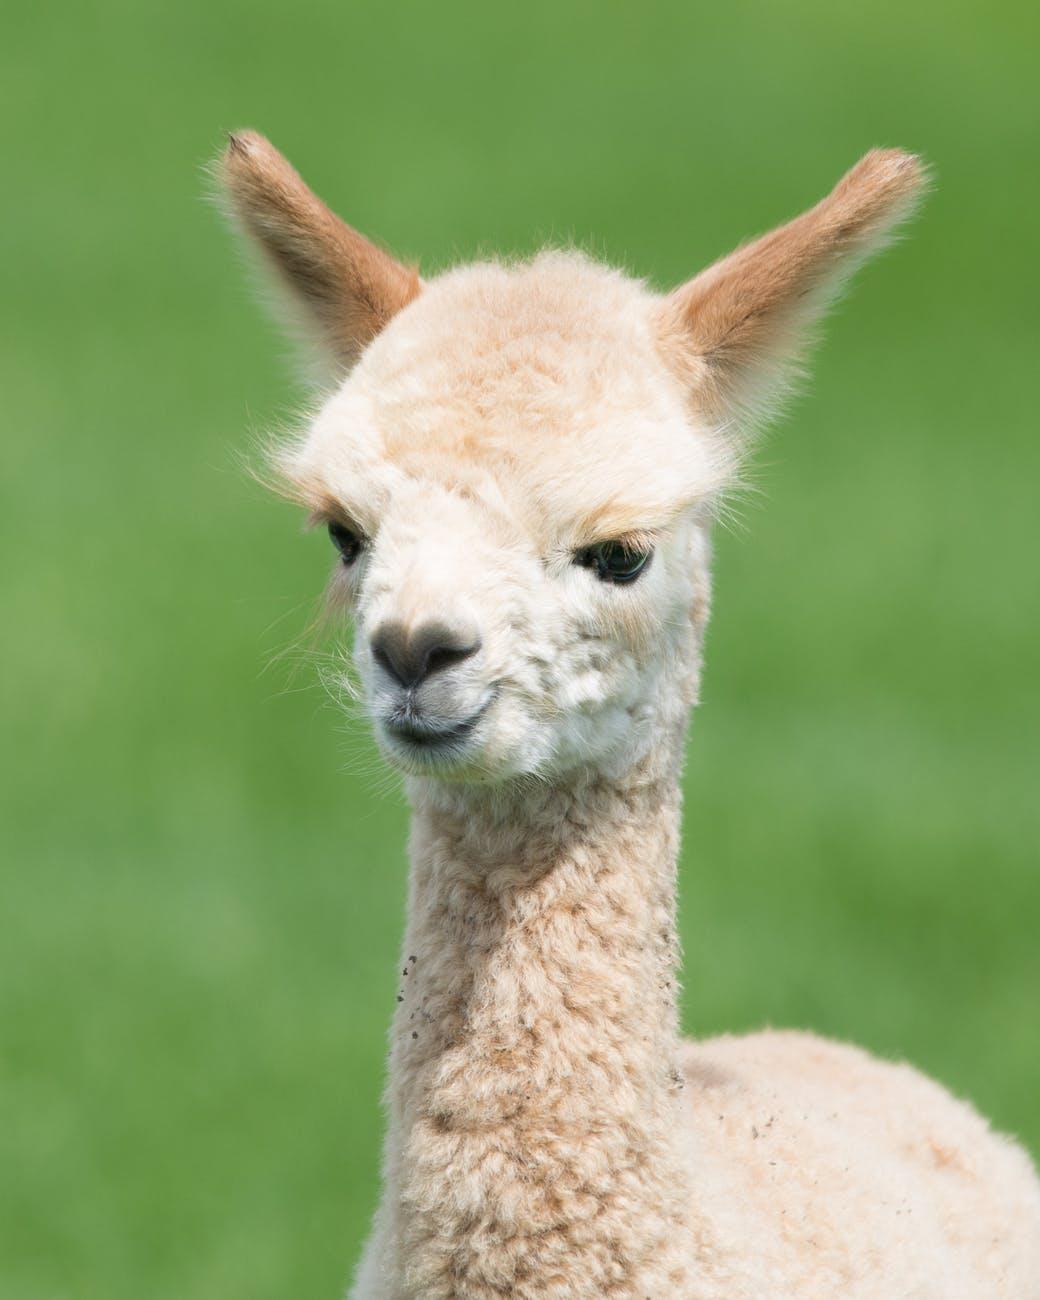 photo of a llama